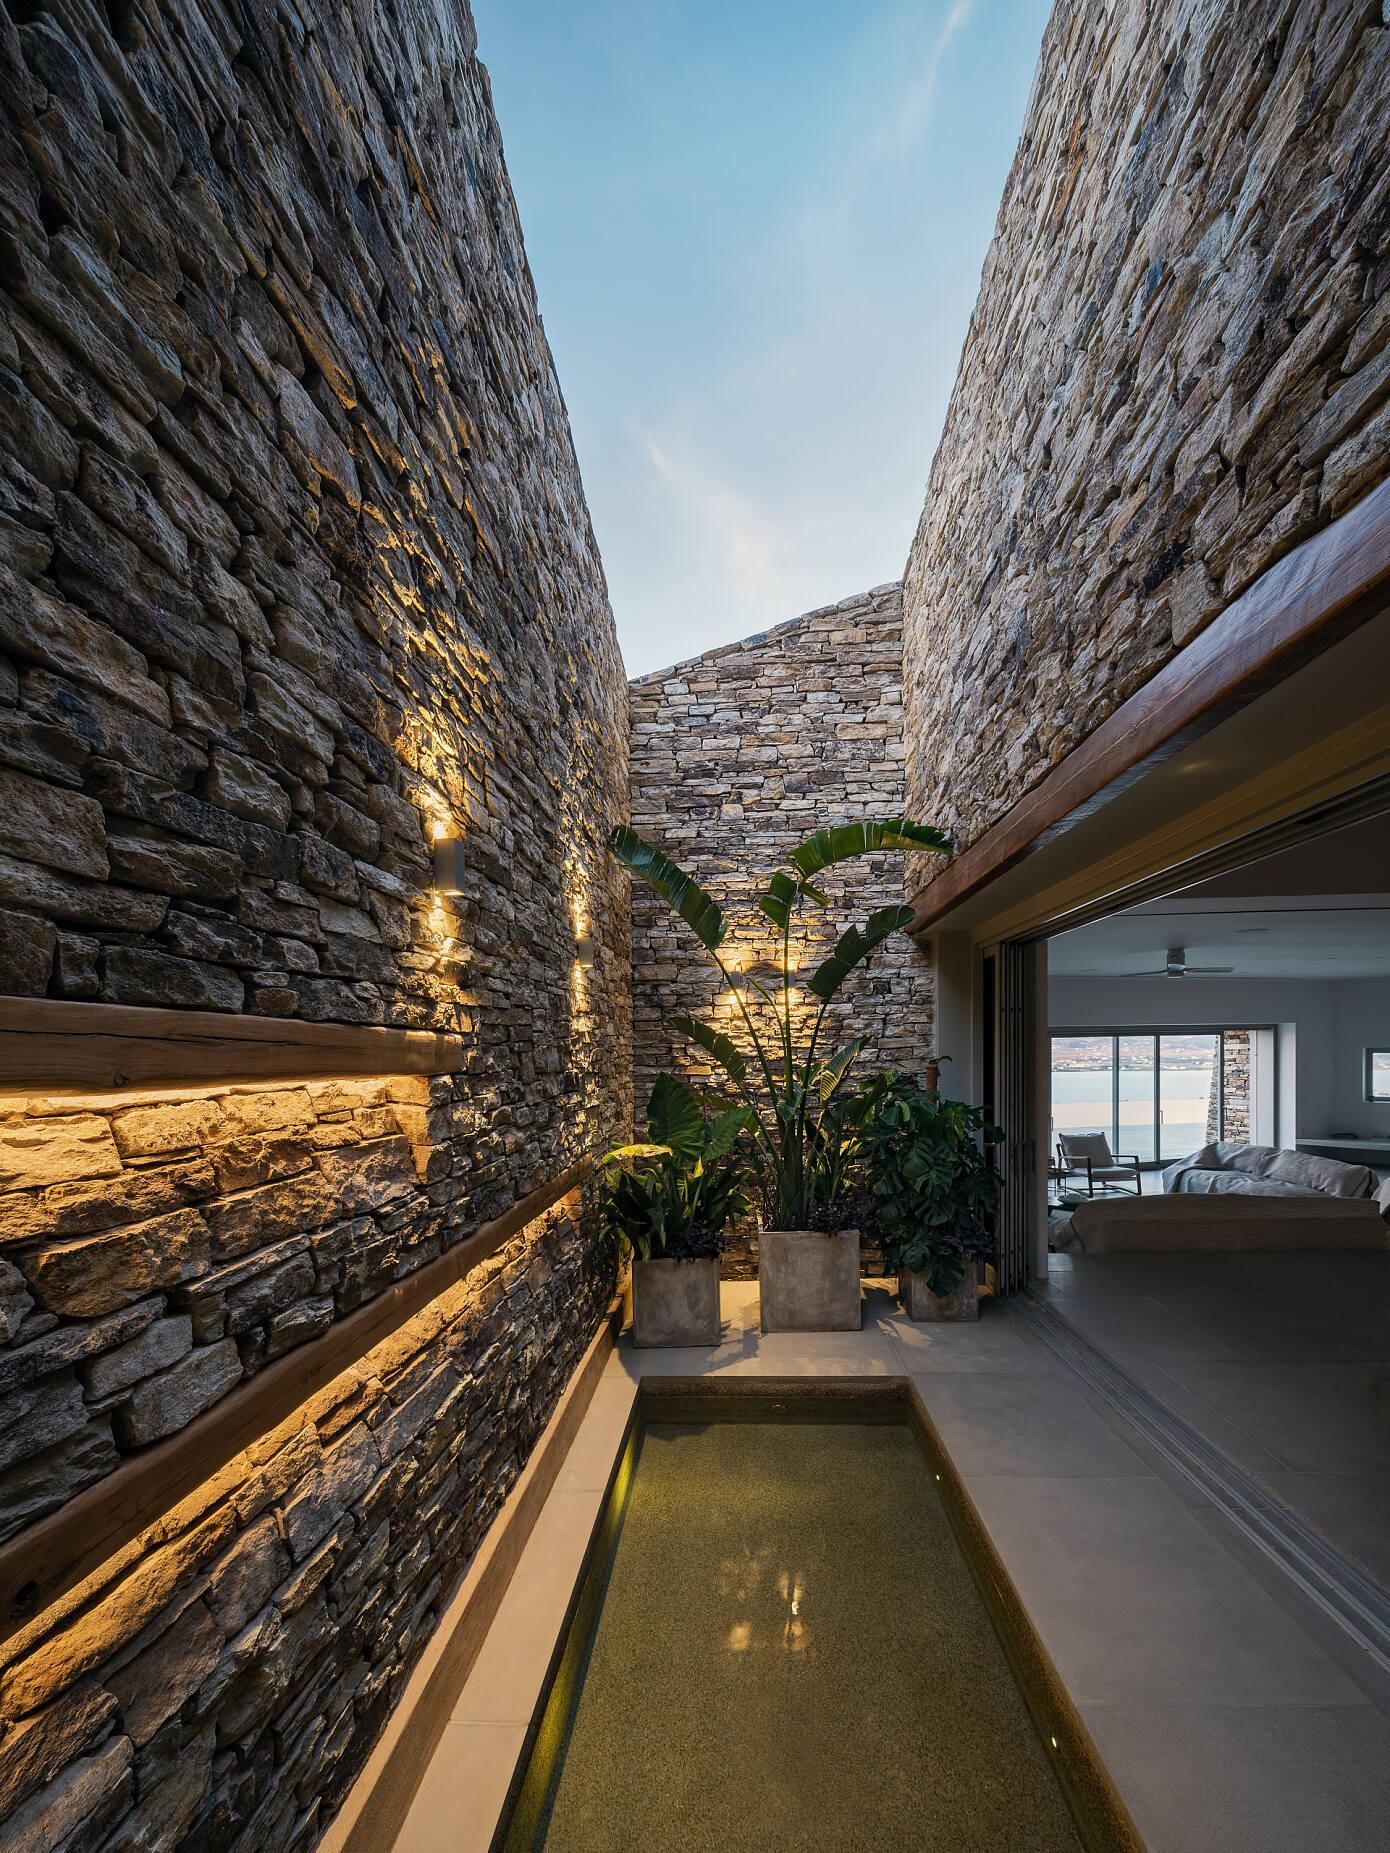 Encaved Stone Villa by Tsolakis Architects